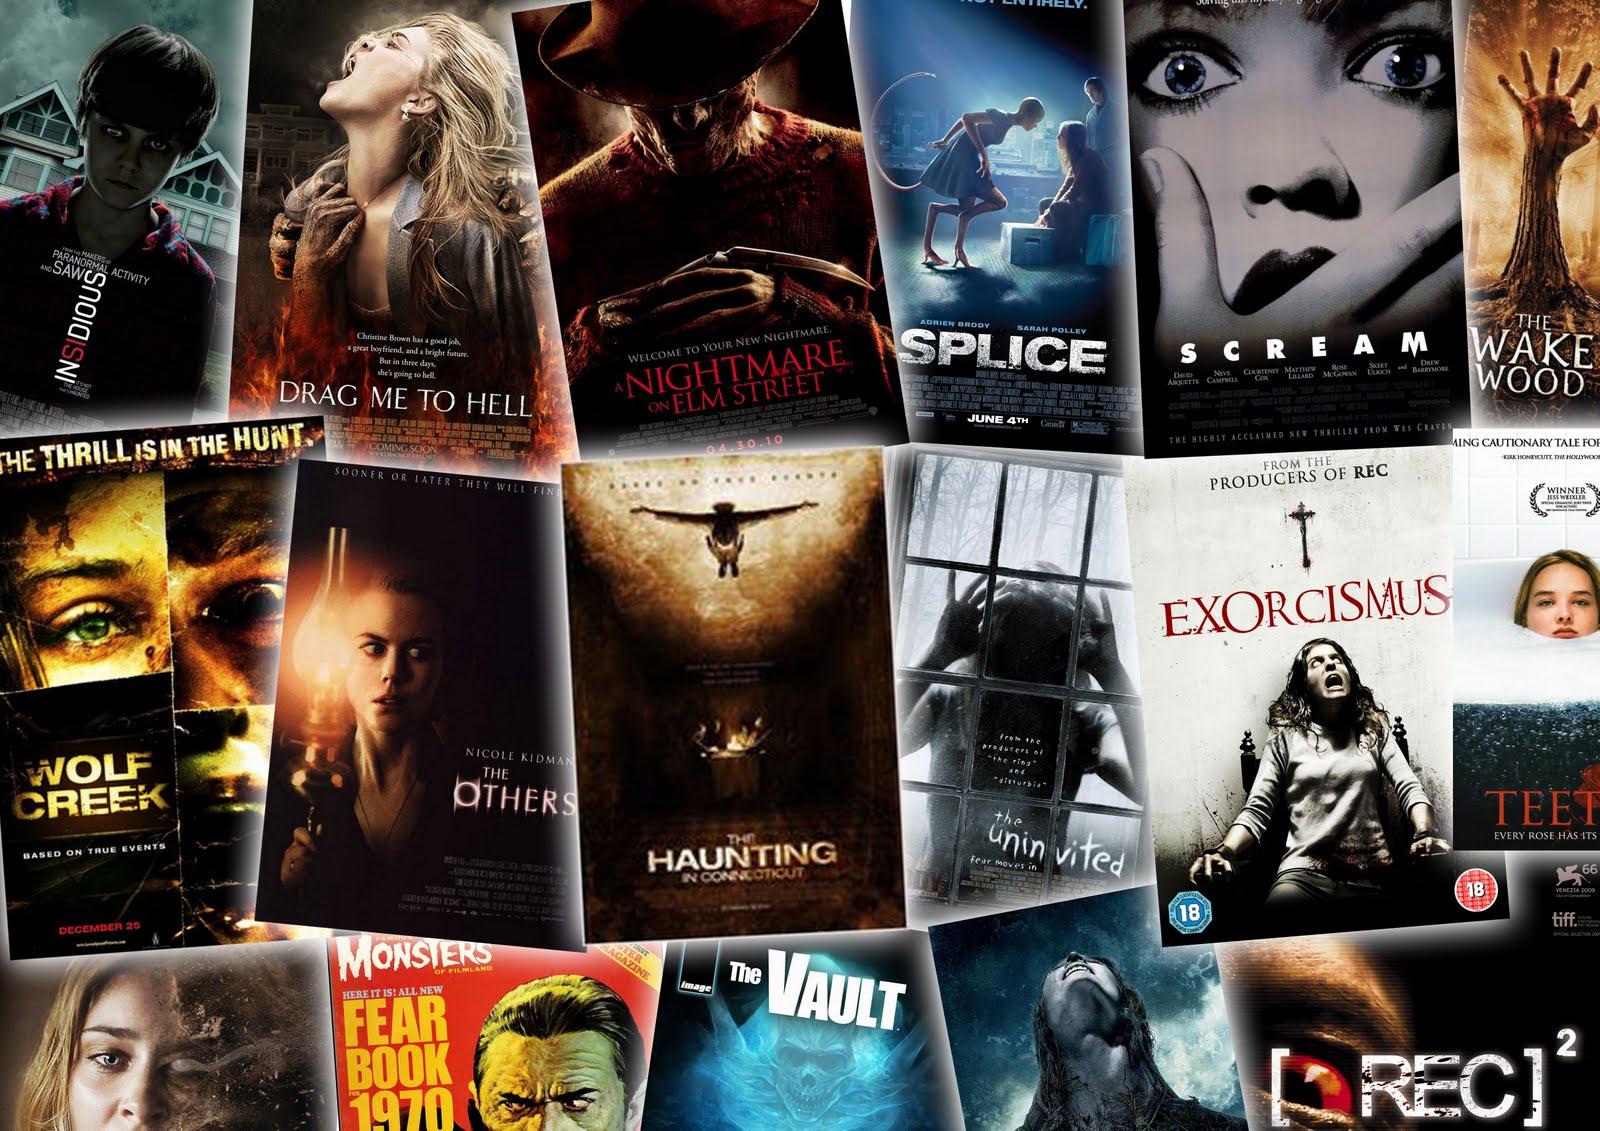 I migliori siti per vedere Film in Streaming Gratis